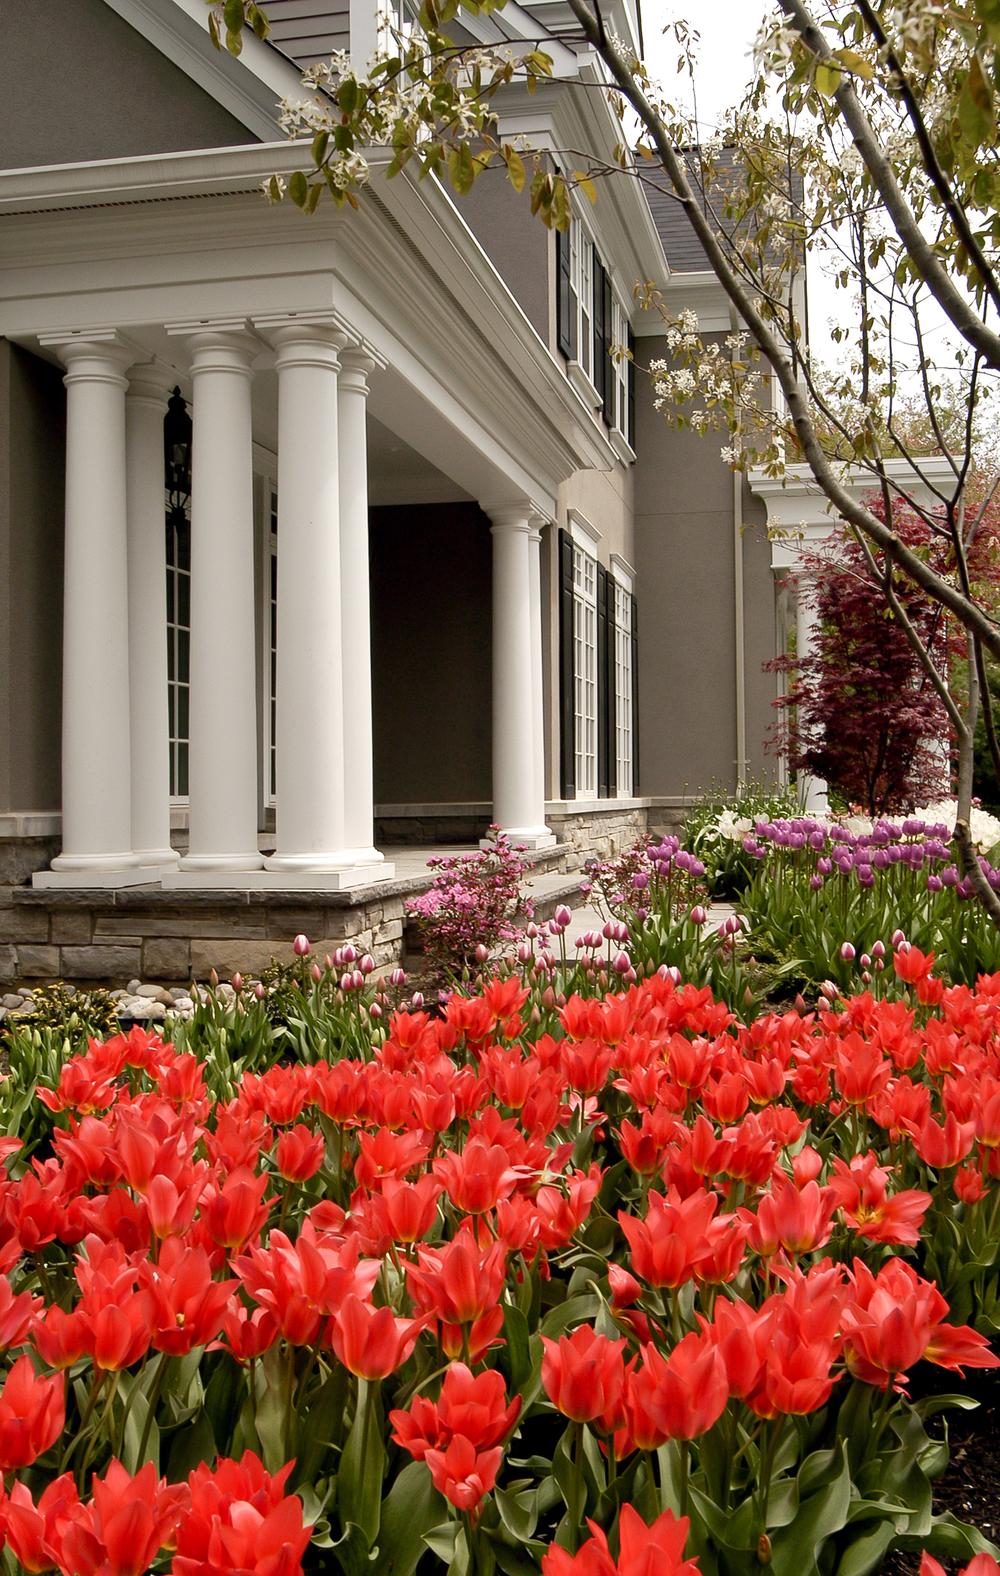 20030528-tulips.jpg